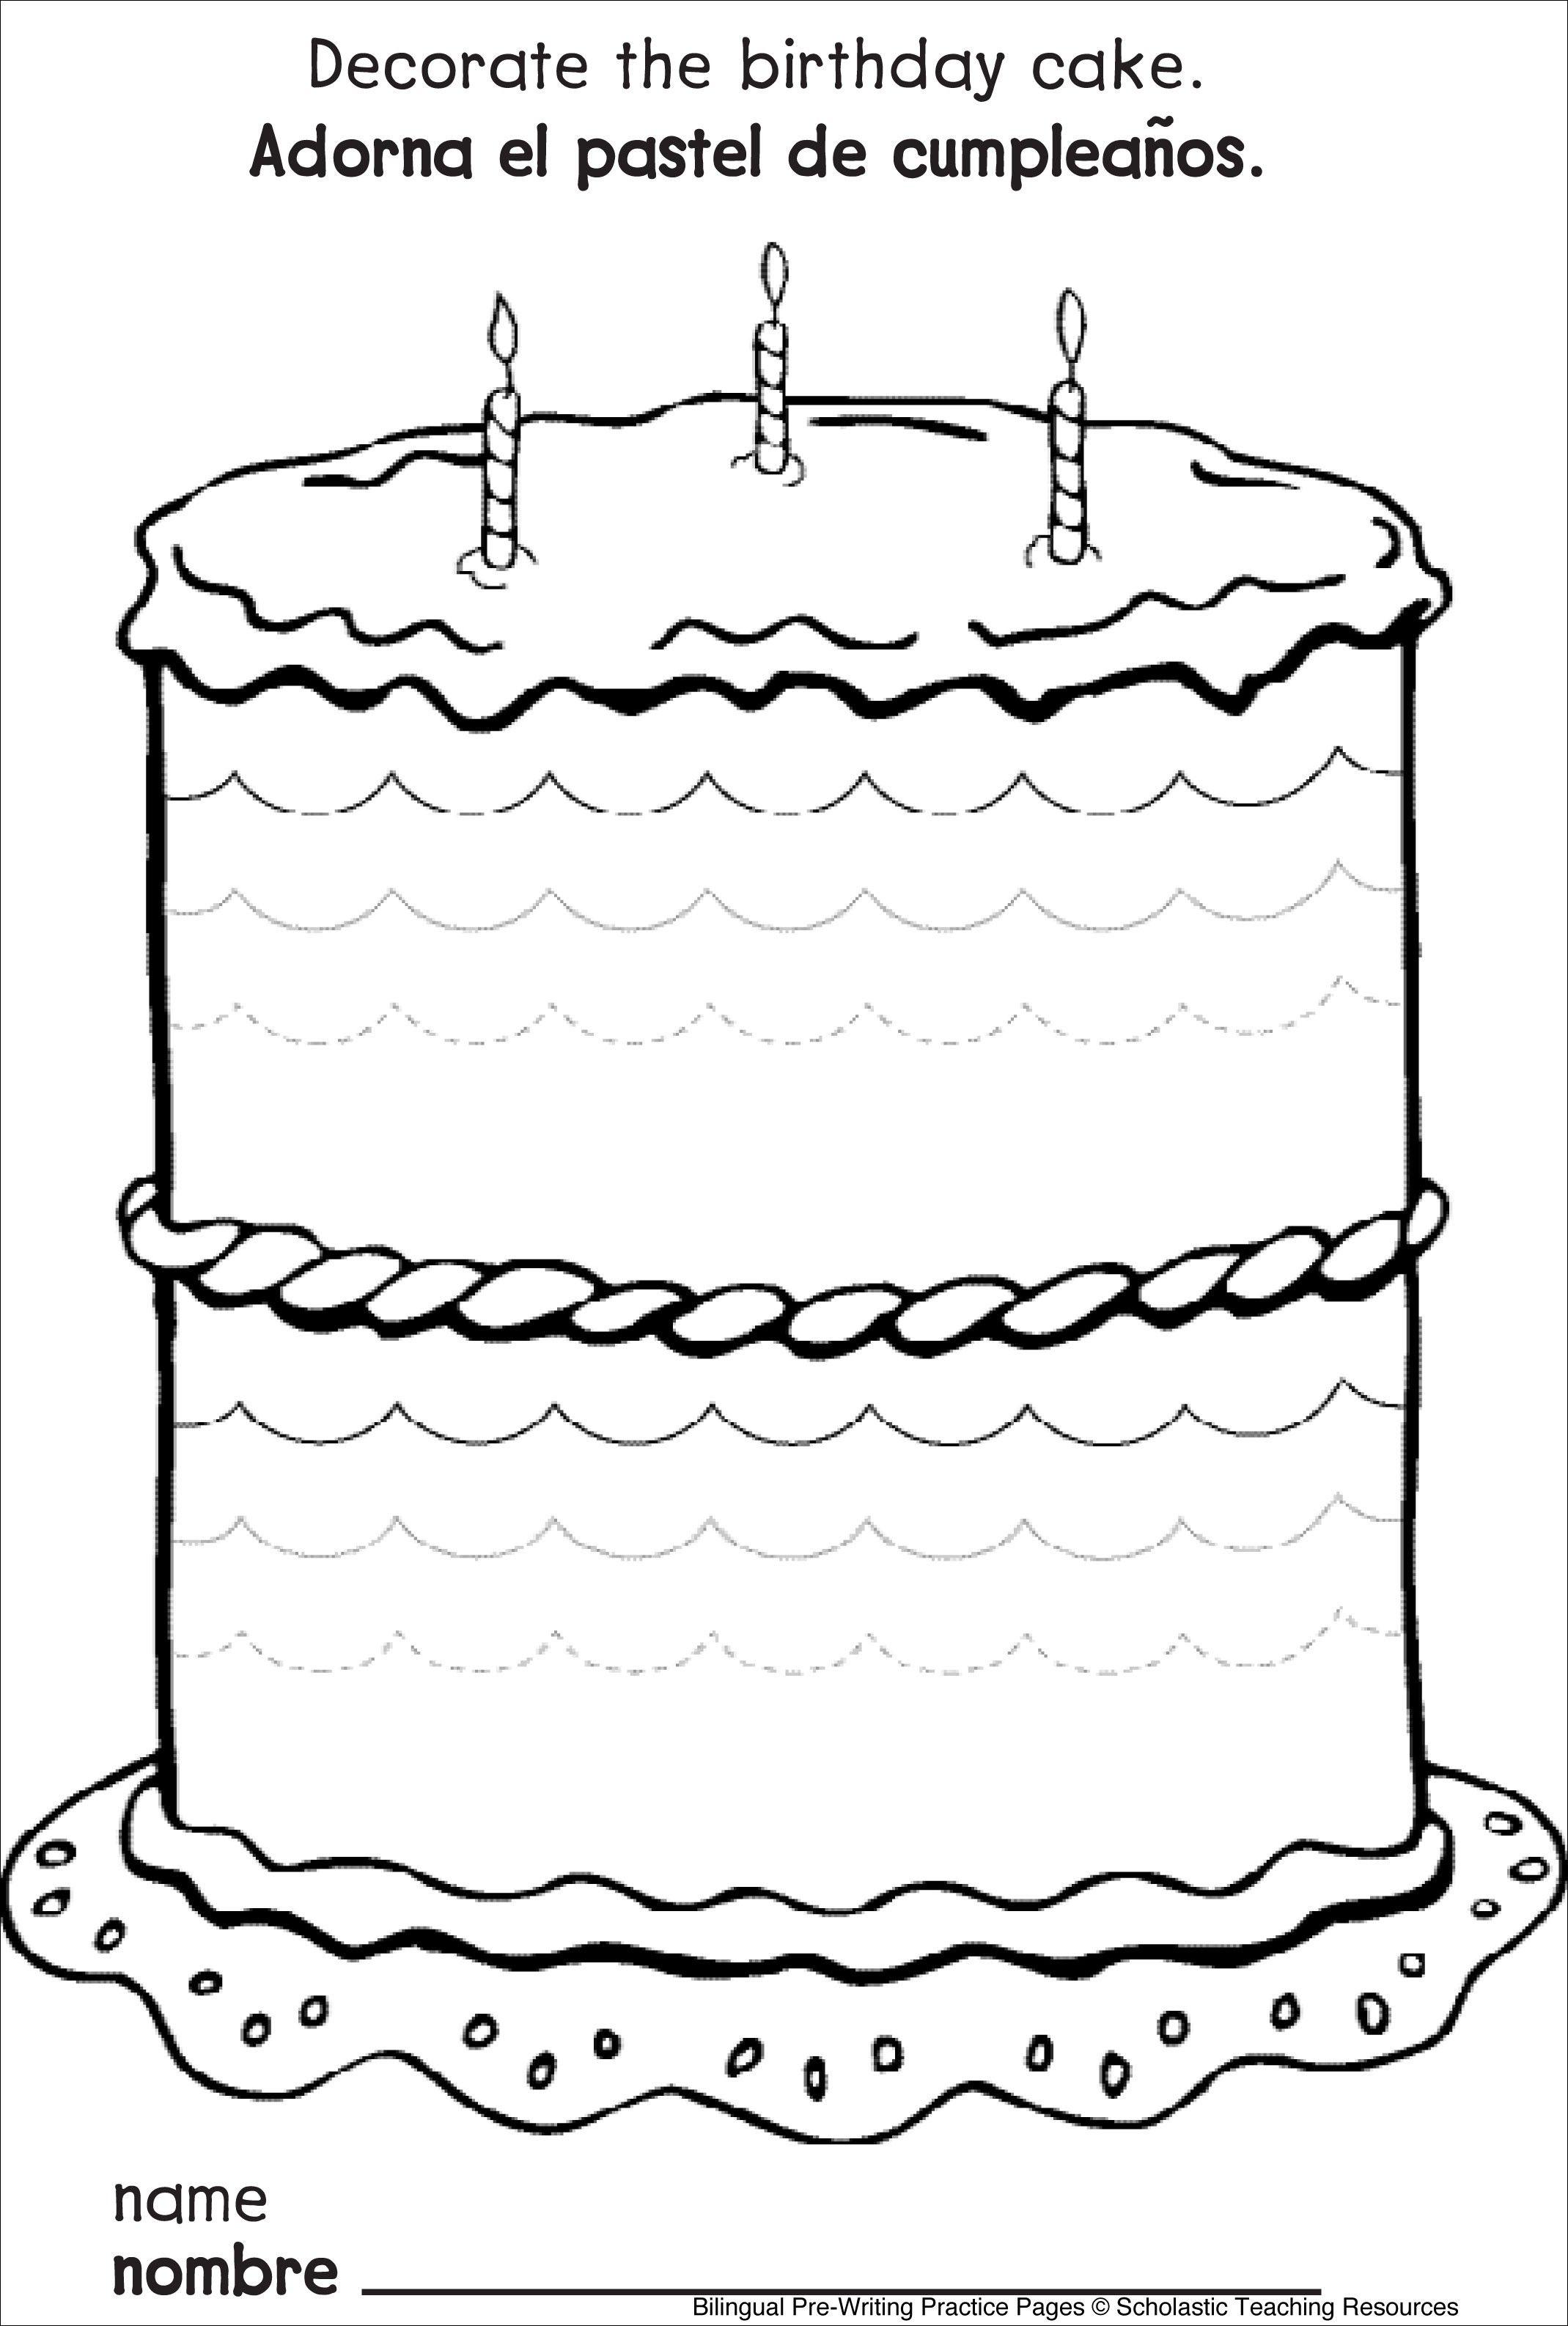 schrijfpatroon taart | Hoera | Pinterest | Schwungübungen und ...